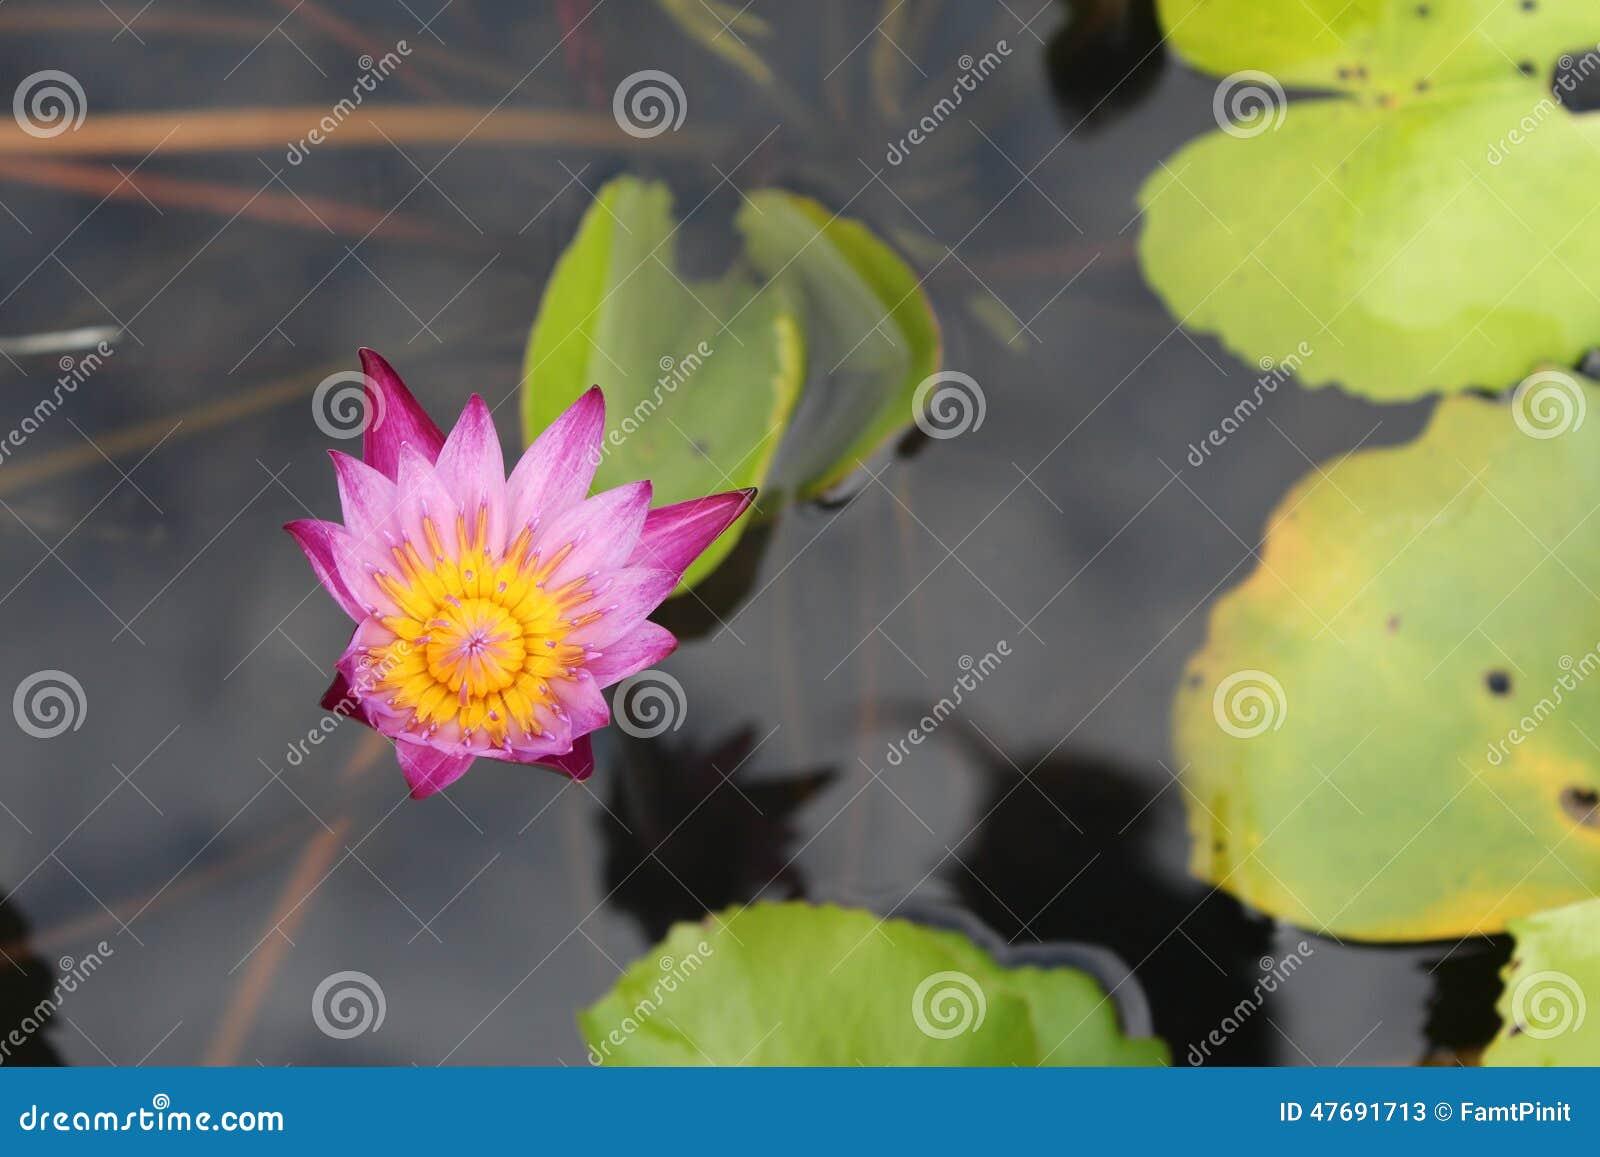 Lotus Flower Stock Image Image Of Flower Perennial 47691713